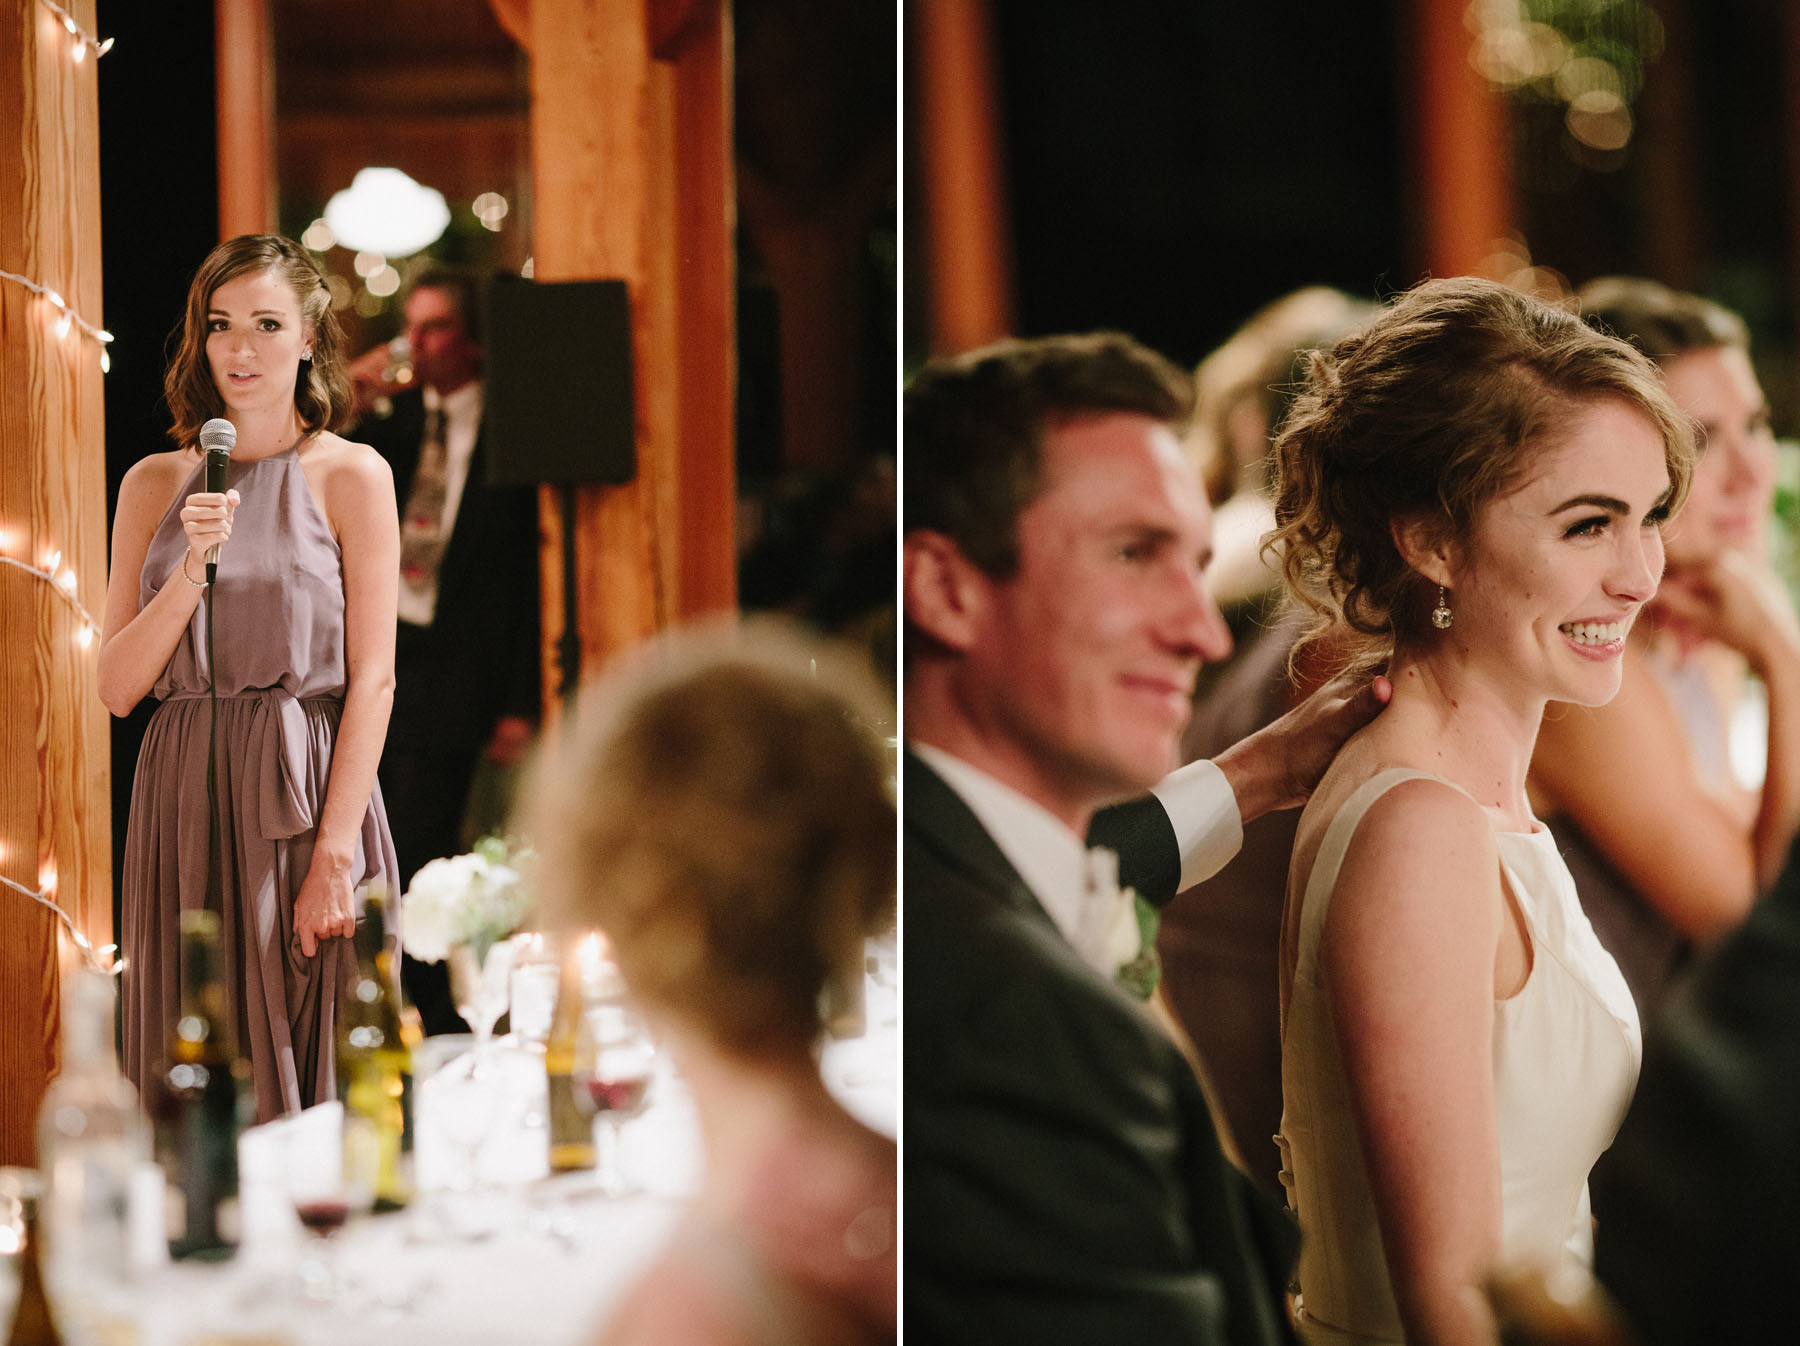 thetis-island-wedding-photographer-rp-rn-184.jpg